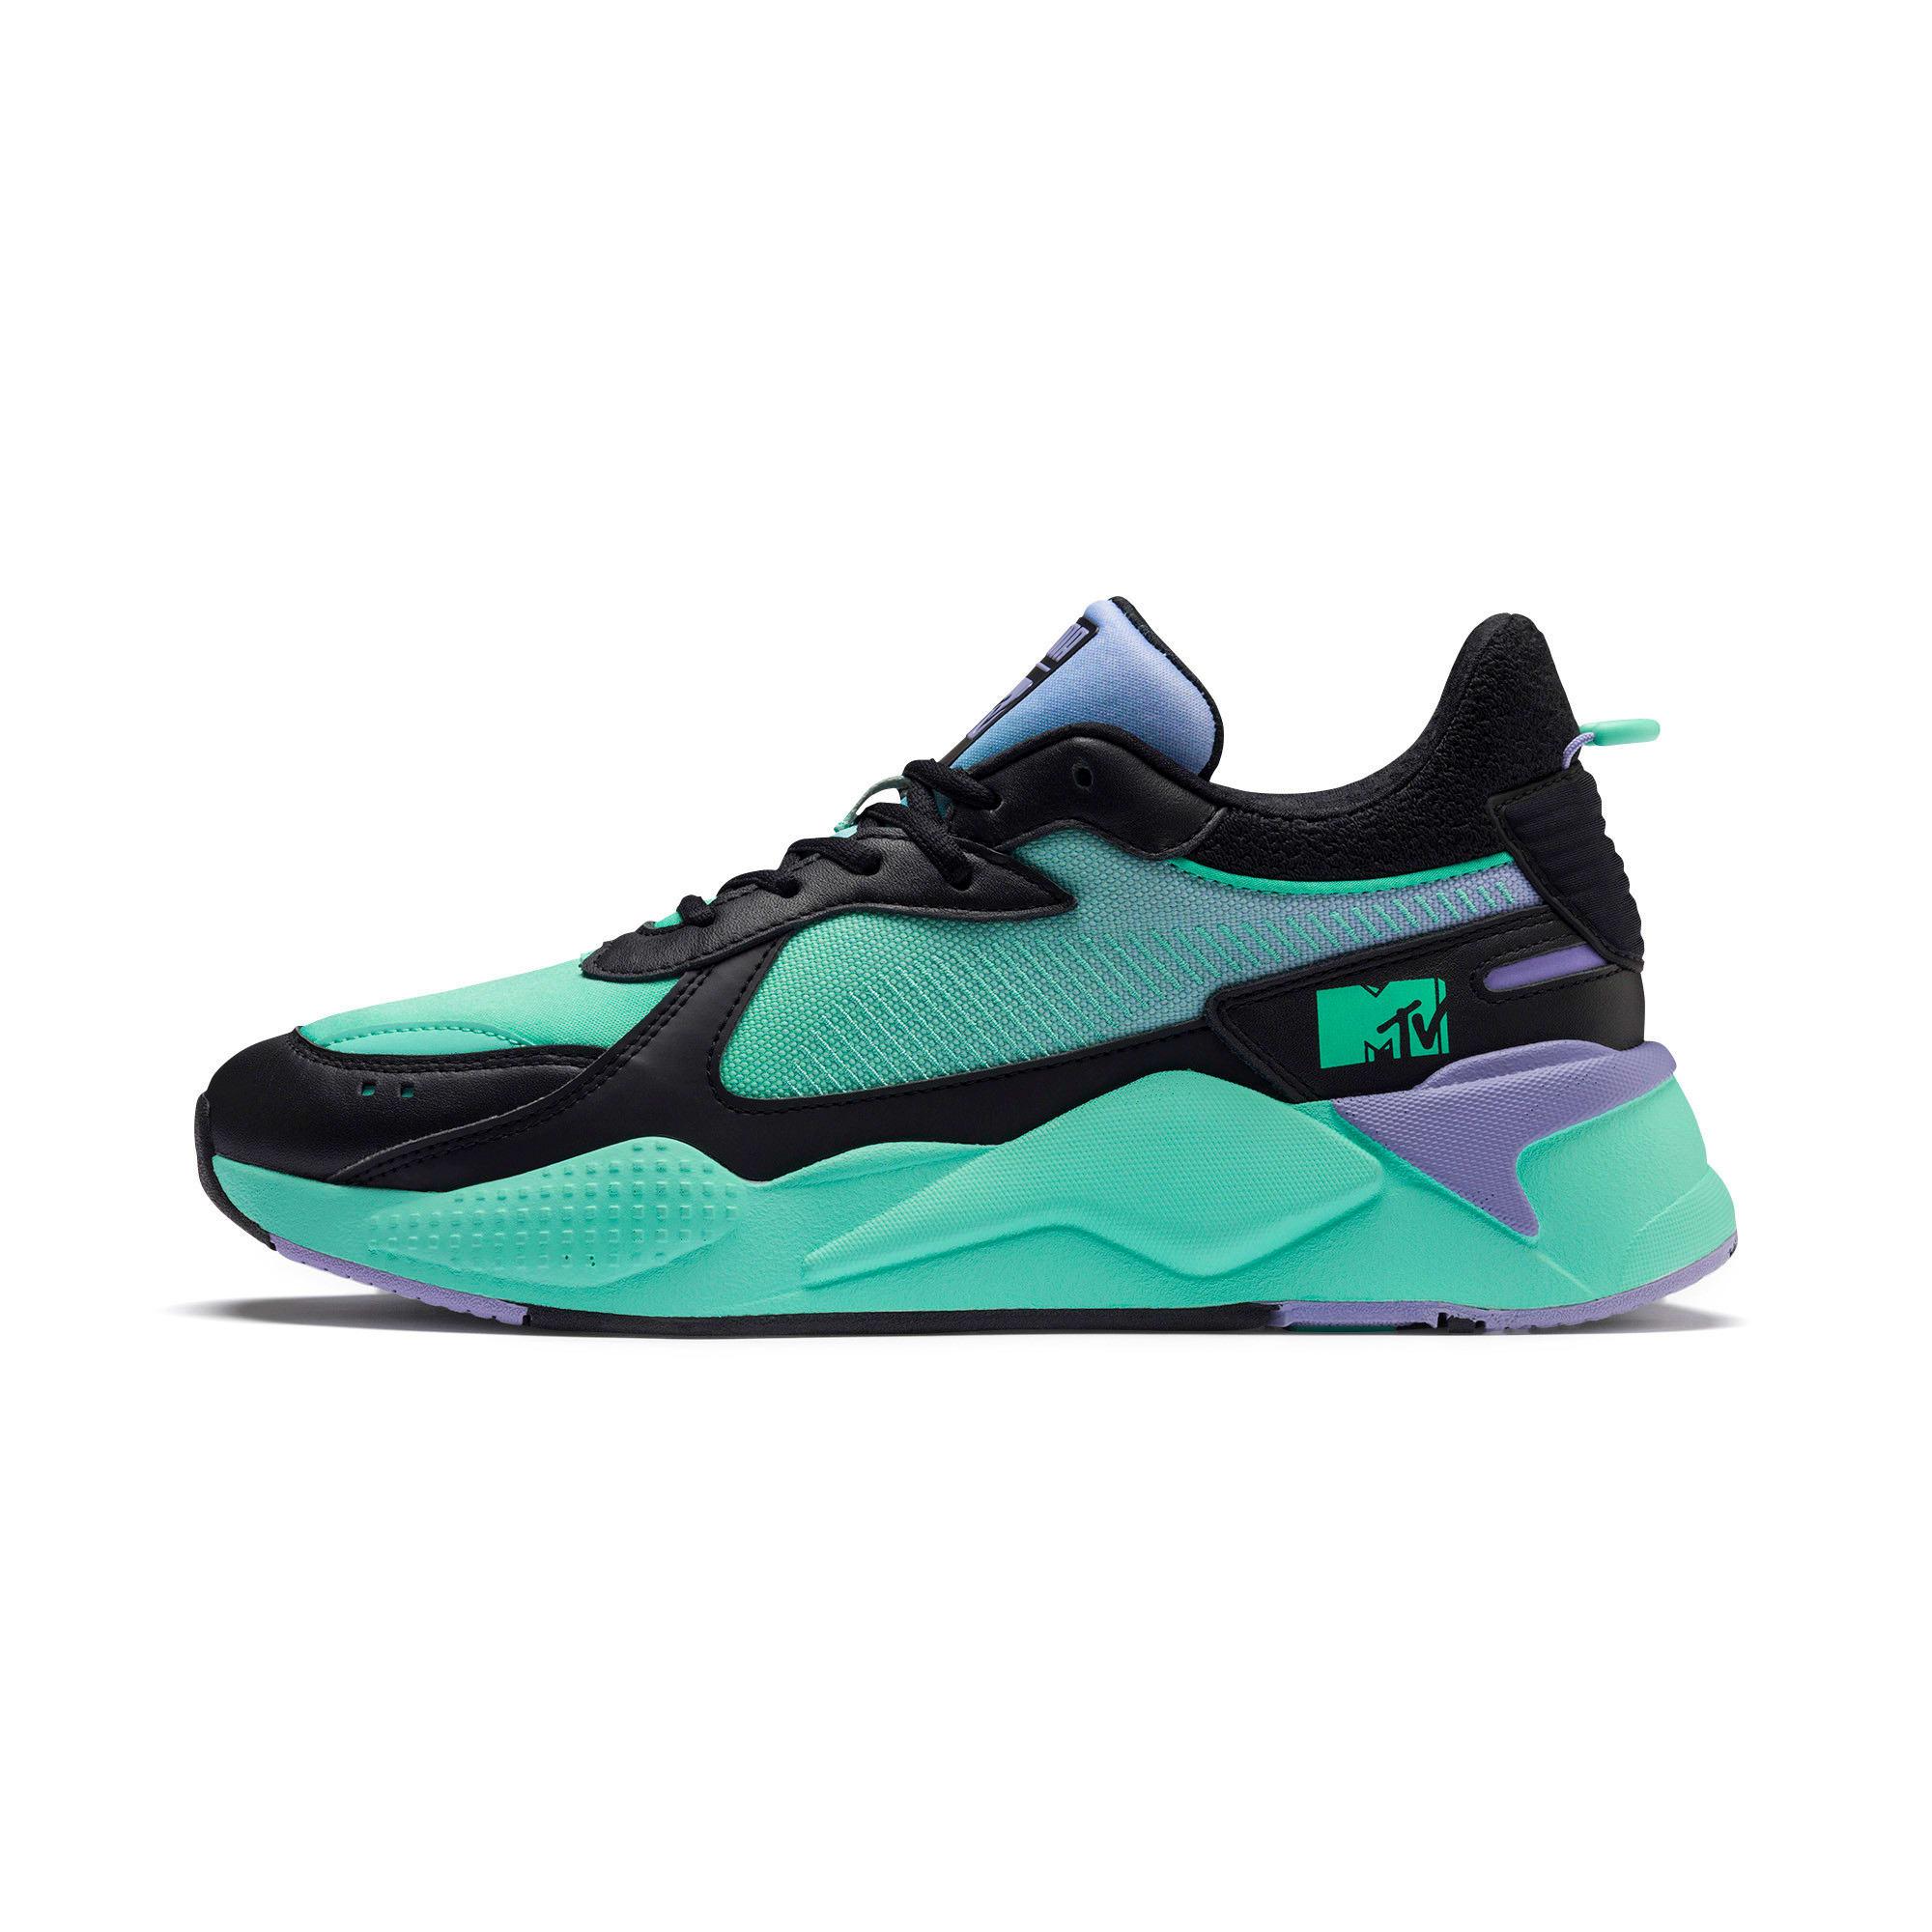 Thumbnail 1 of RS-X Tracks MTV Gradient Gloom Sneakers, Puma Black-Sweet Lavender, medium